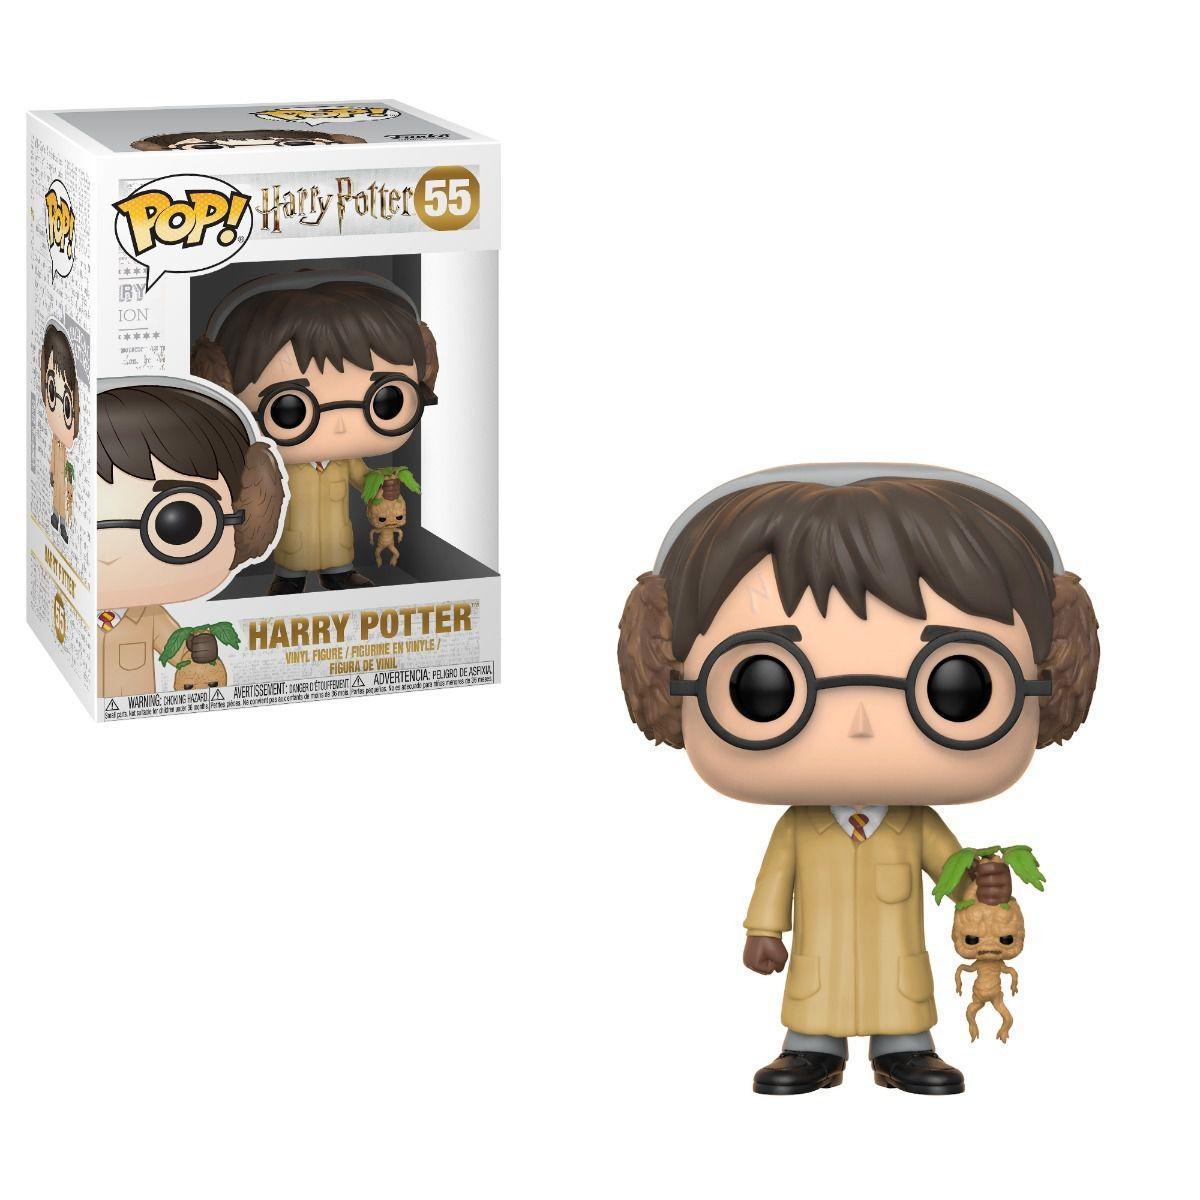 Funko Pop Movies Harry Potter - Harry Potter 55